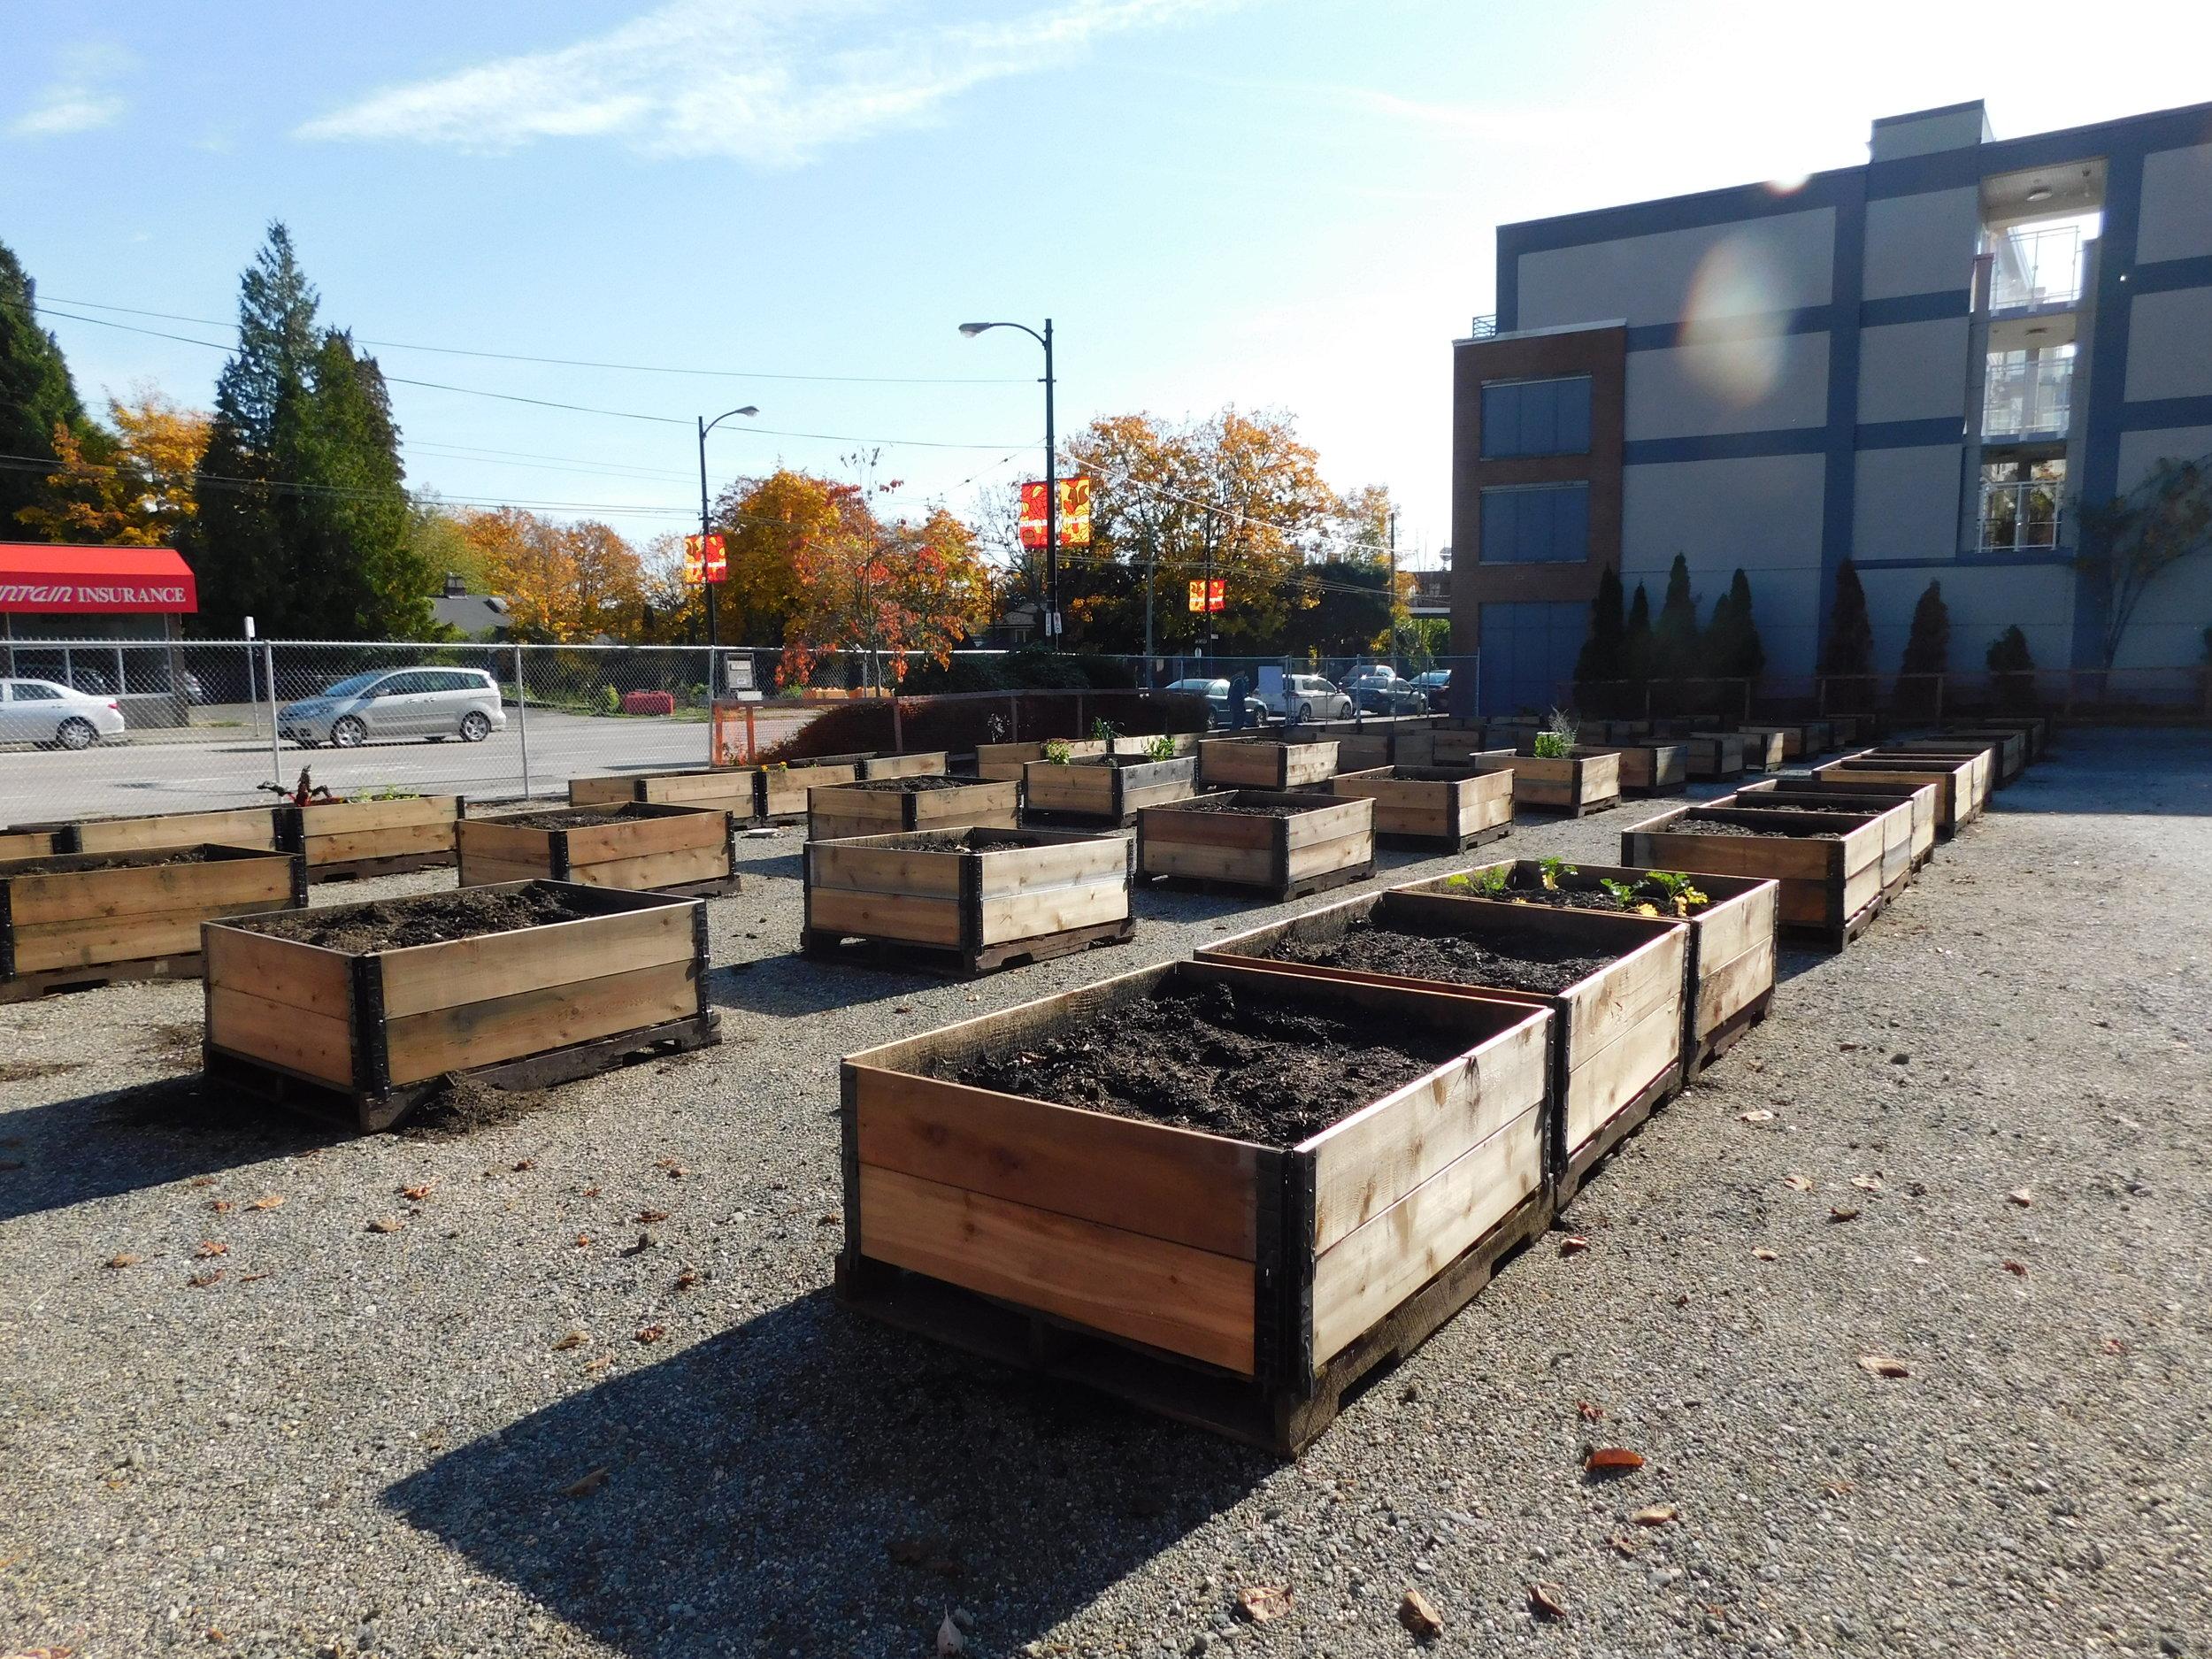 Dunbar_40th_Vancouver_Community_Garden_Builders-0014.JPG